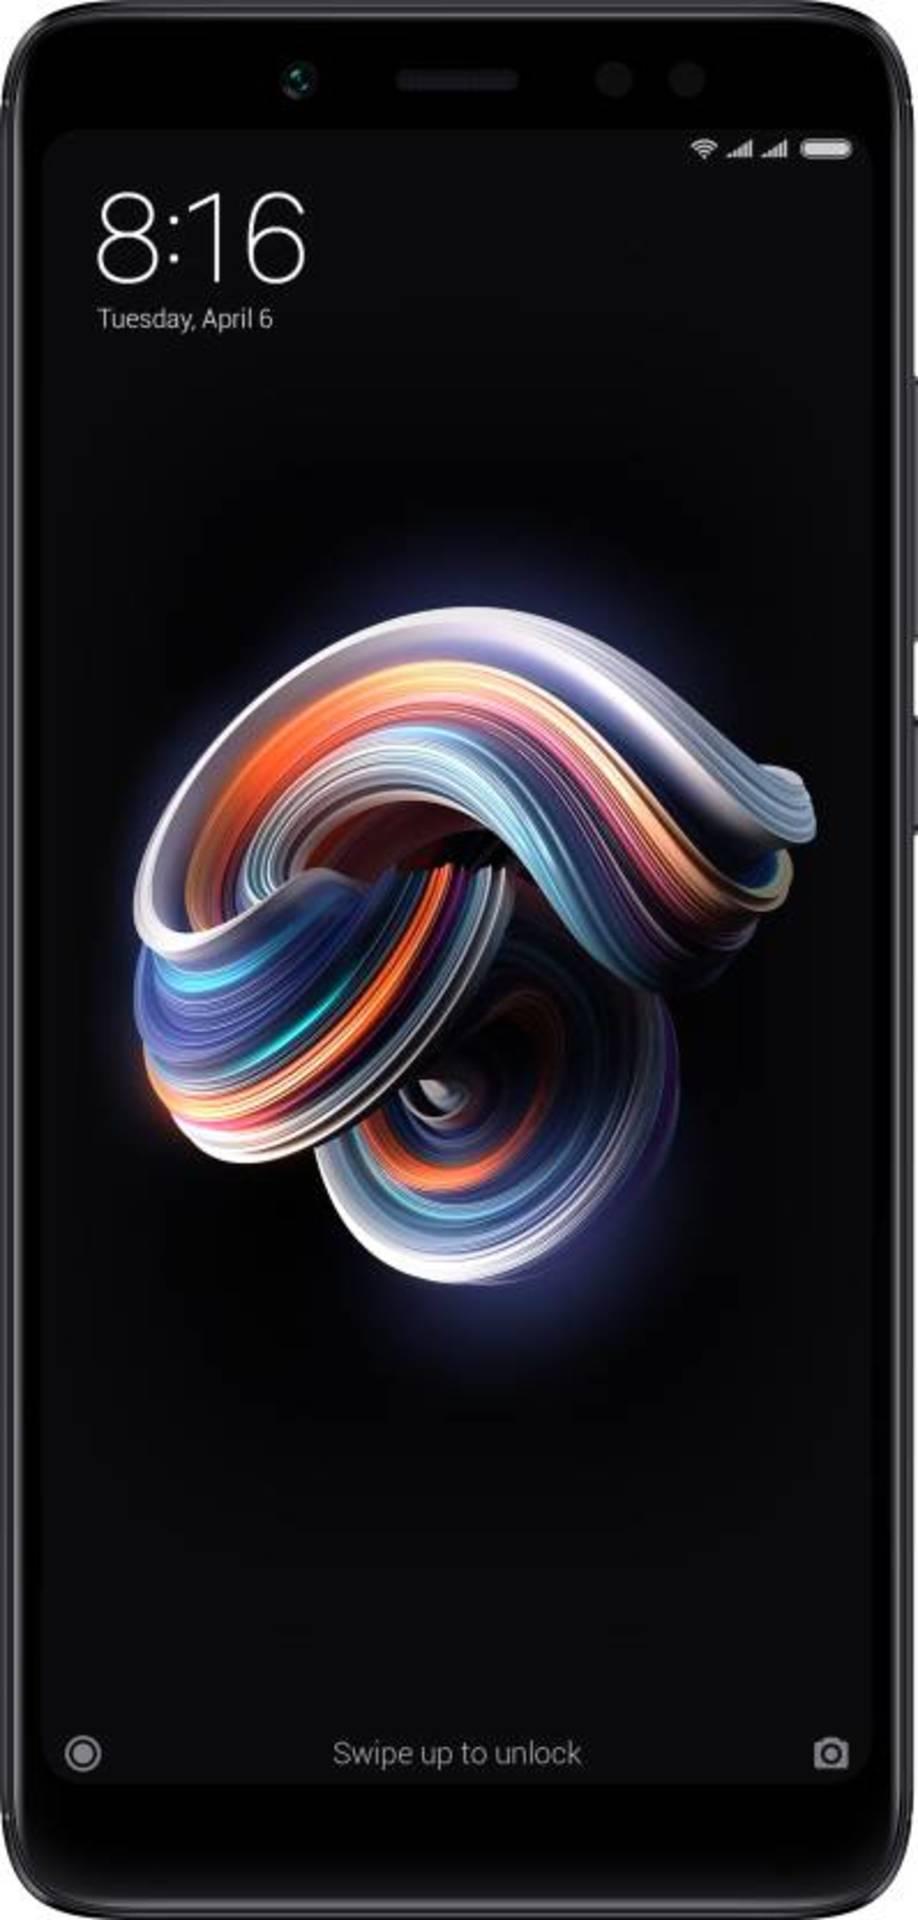 Paytmmall : Xiaomi Redmi Note 5 Pro 64 GB (Black) 4 GB RAM, Dual SIM 4G